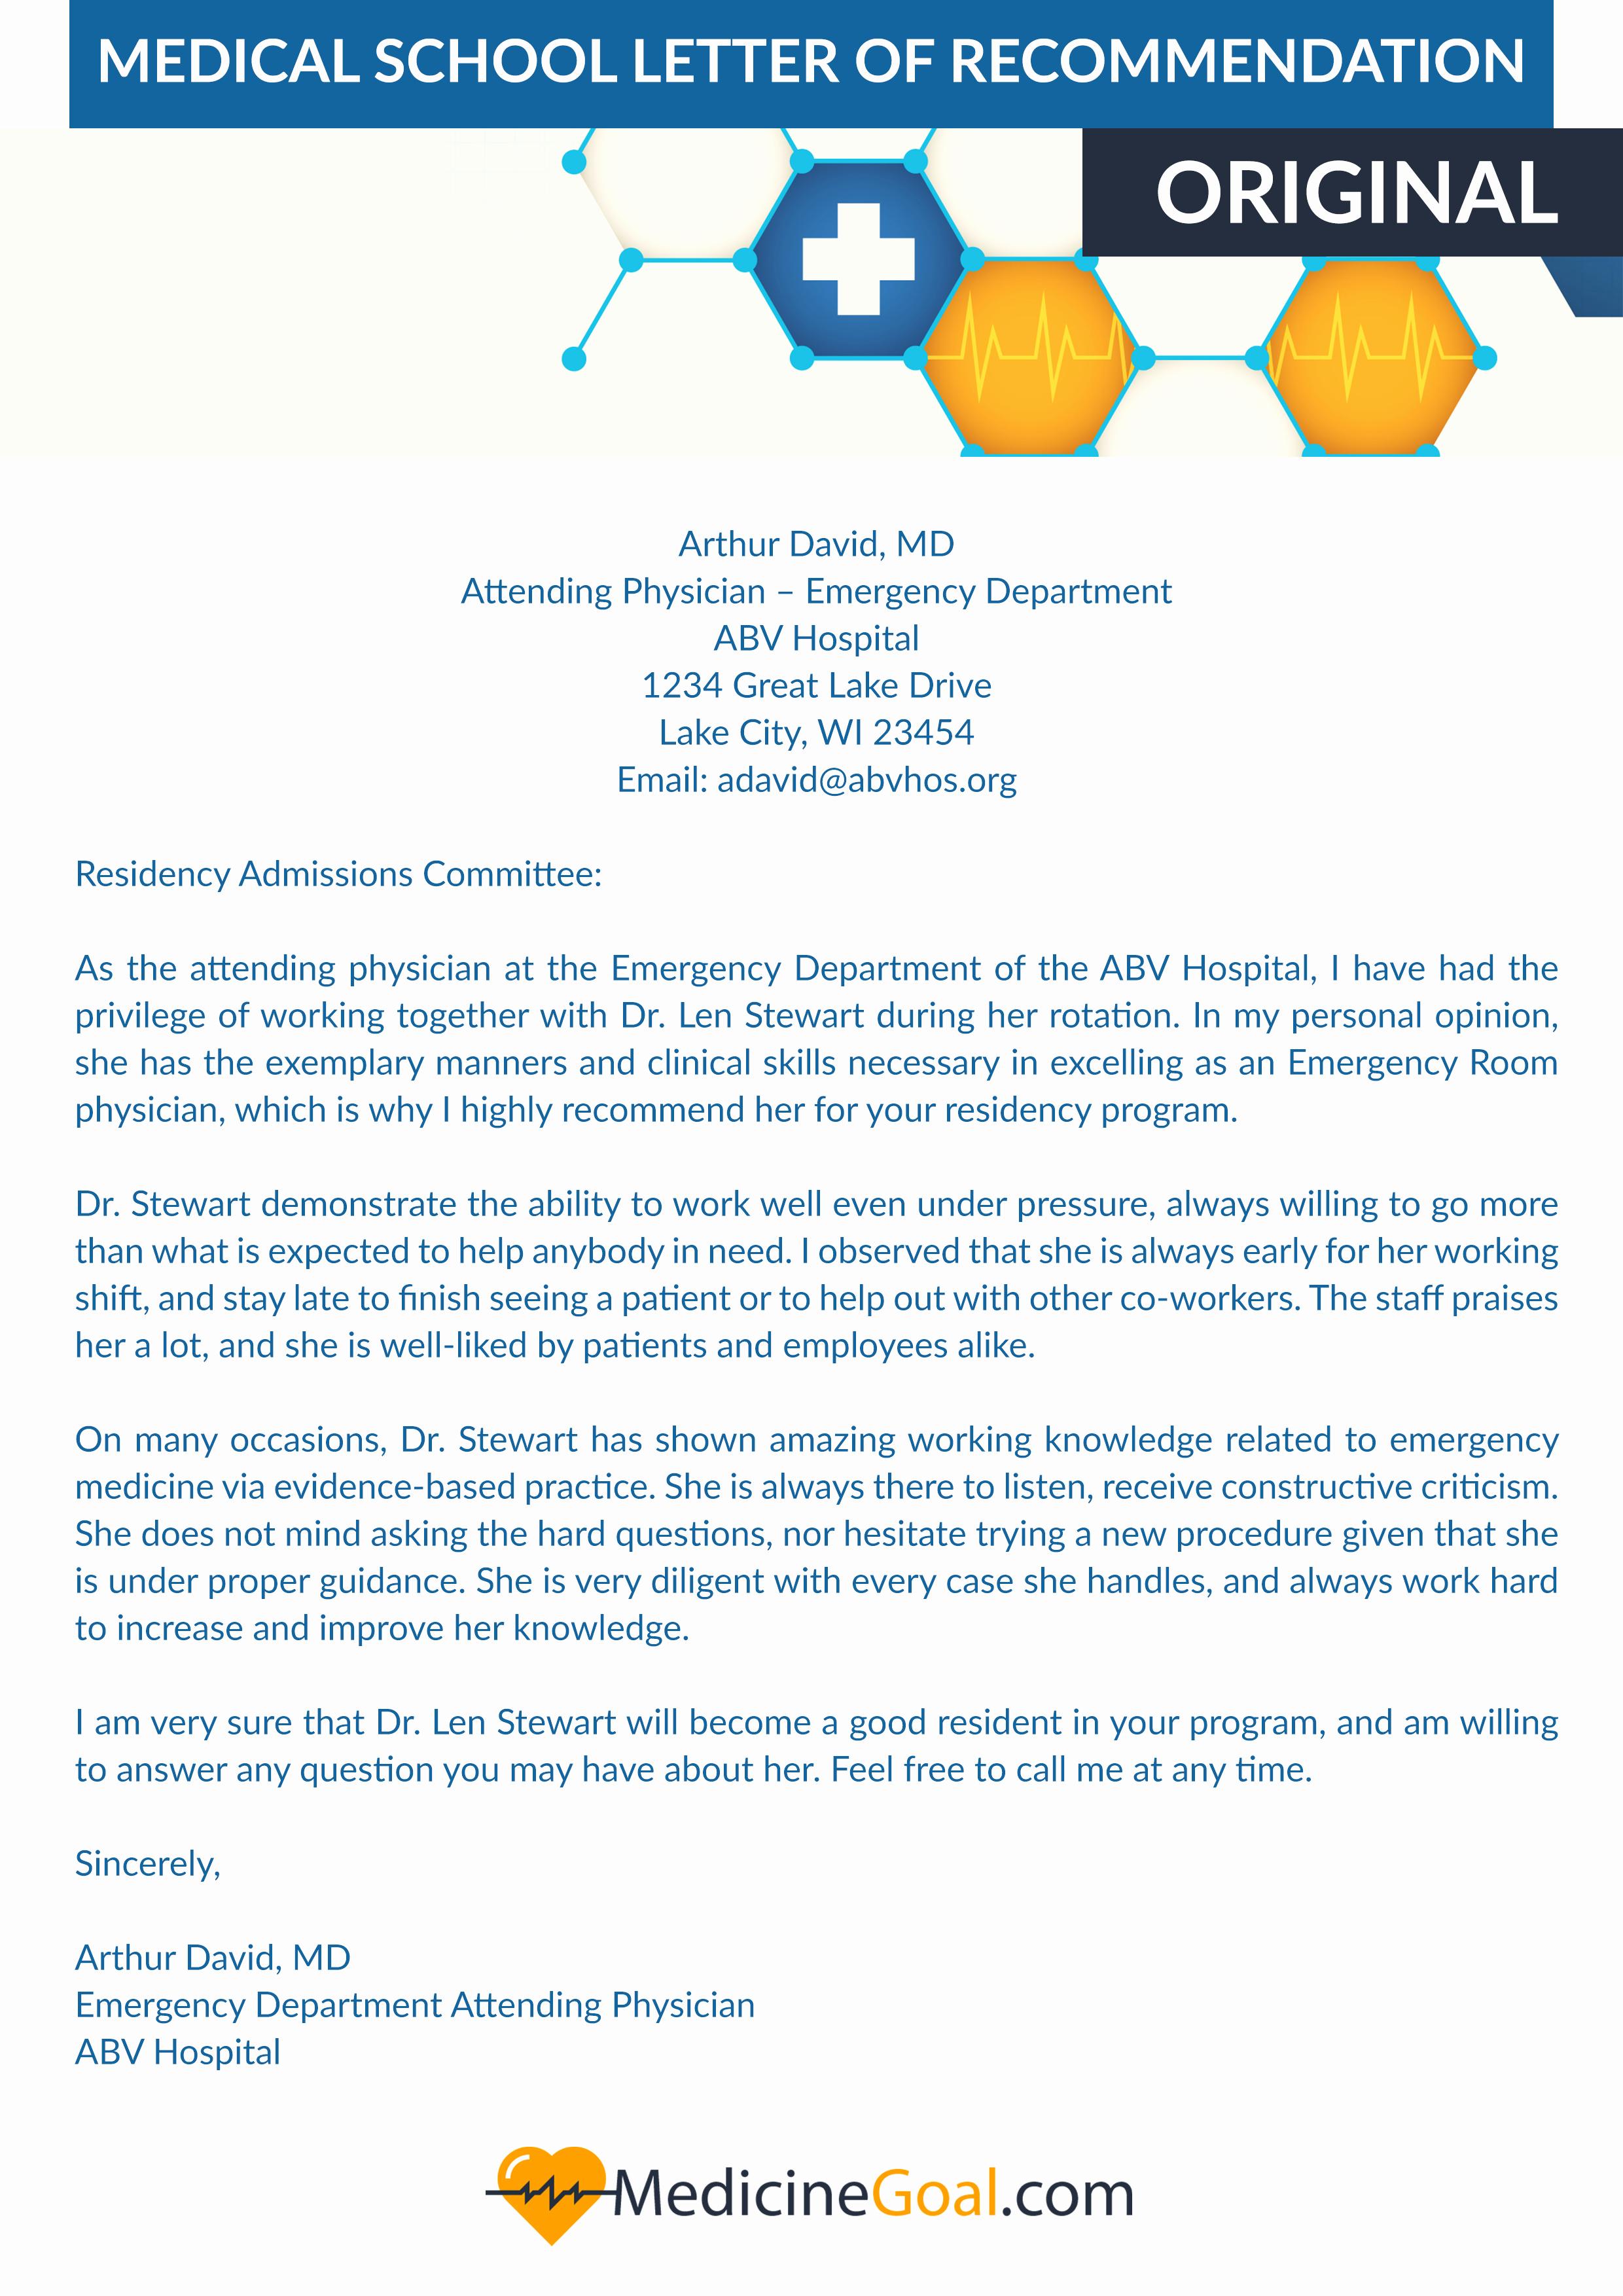 Letter Of Recommendation Amcas Lovely Effective Medical School Letter Of Re Mendation Help